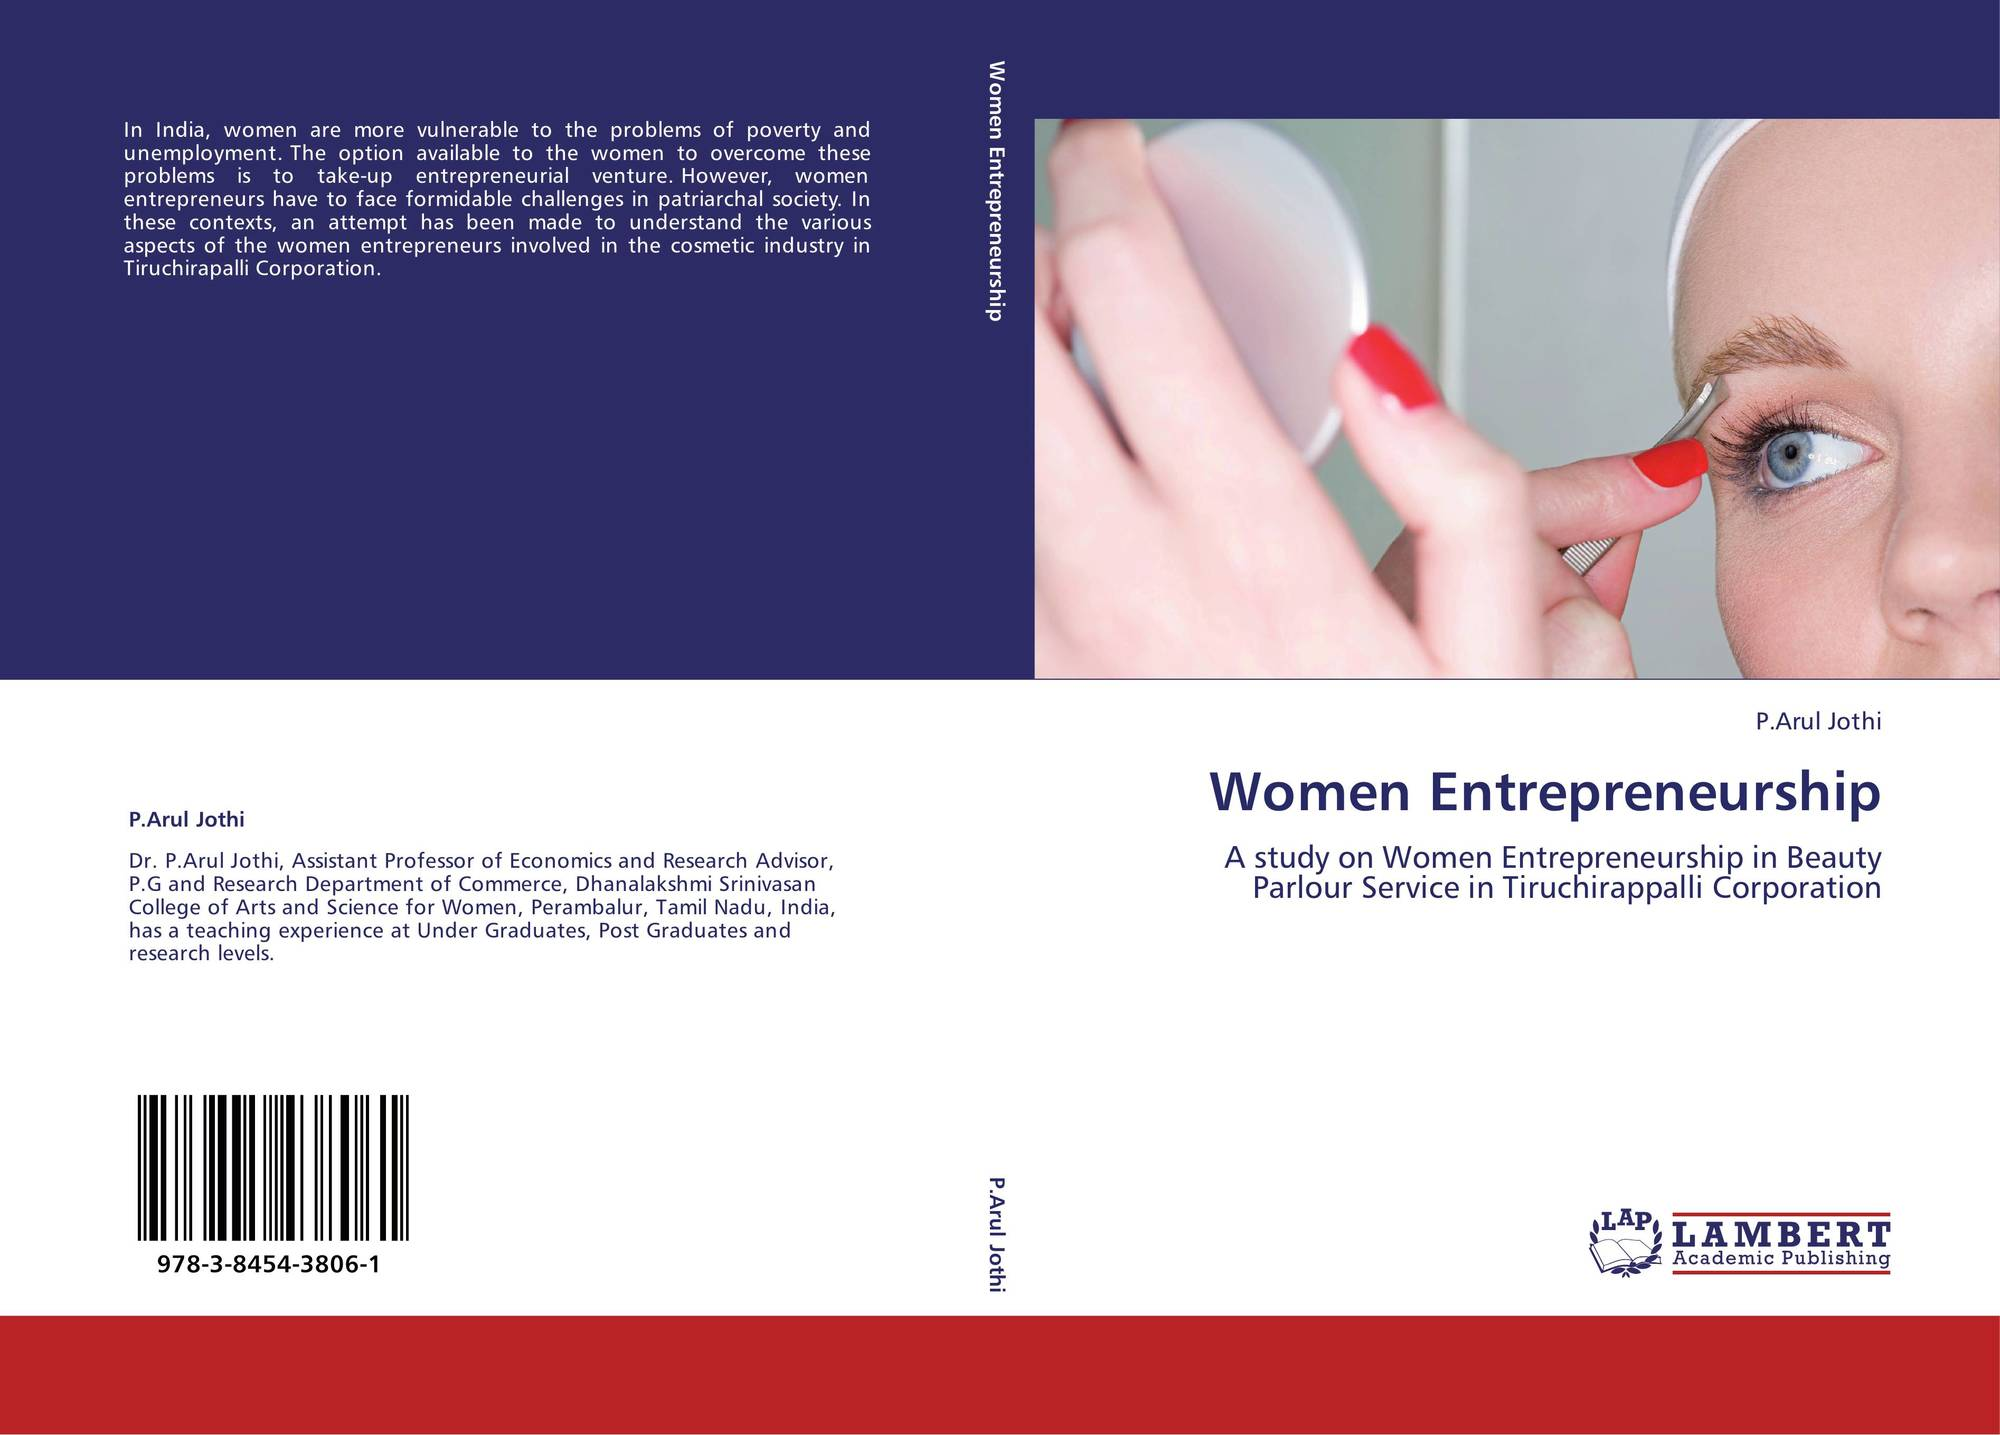 Women enterpreneur